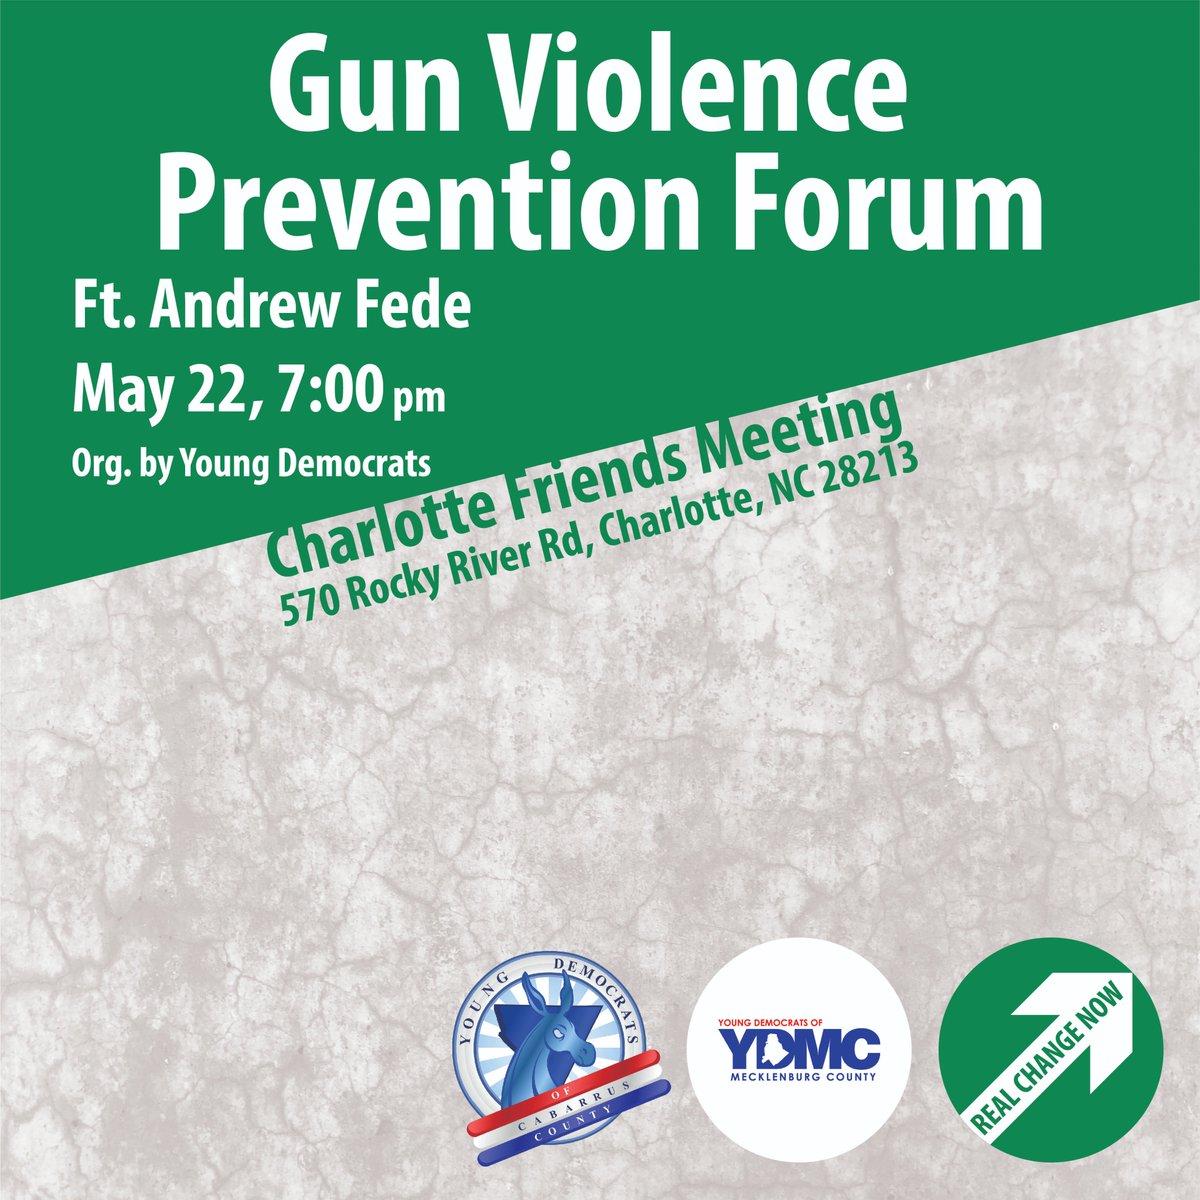 preventing gun violence resolution - HD1200×1200